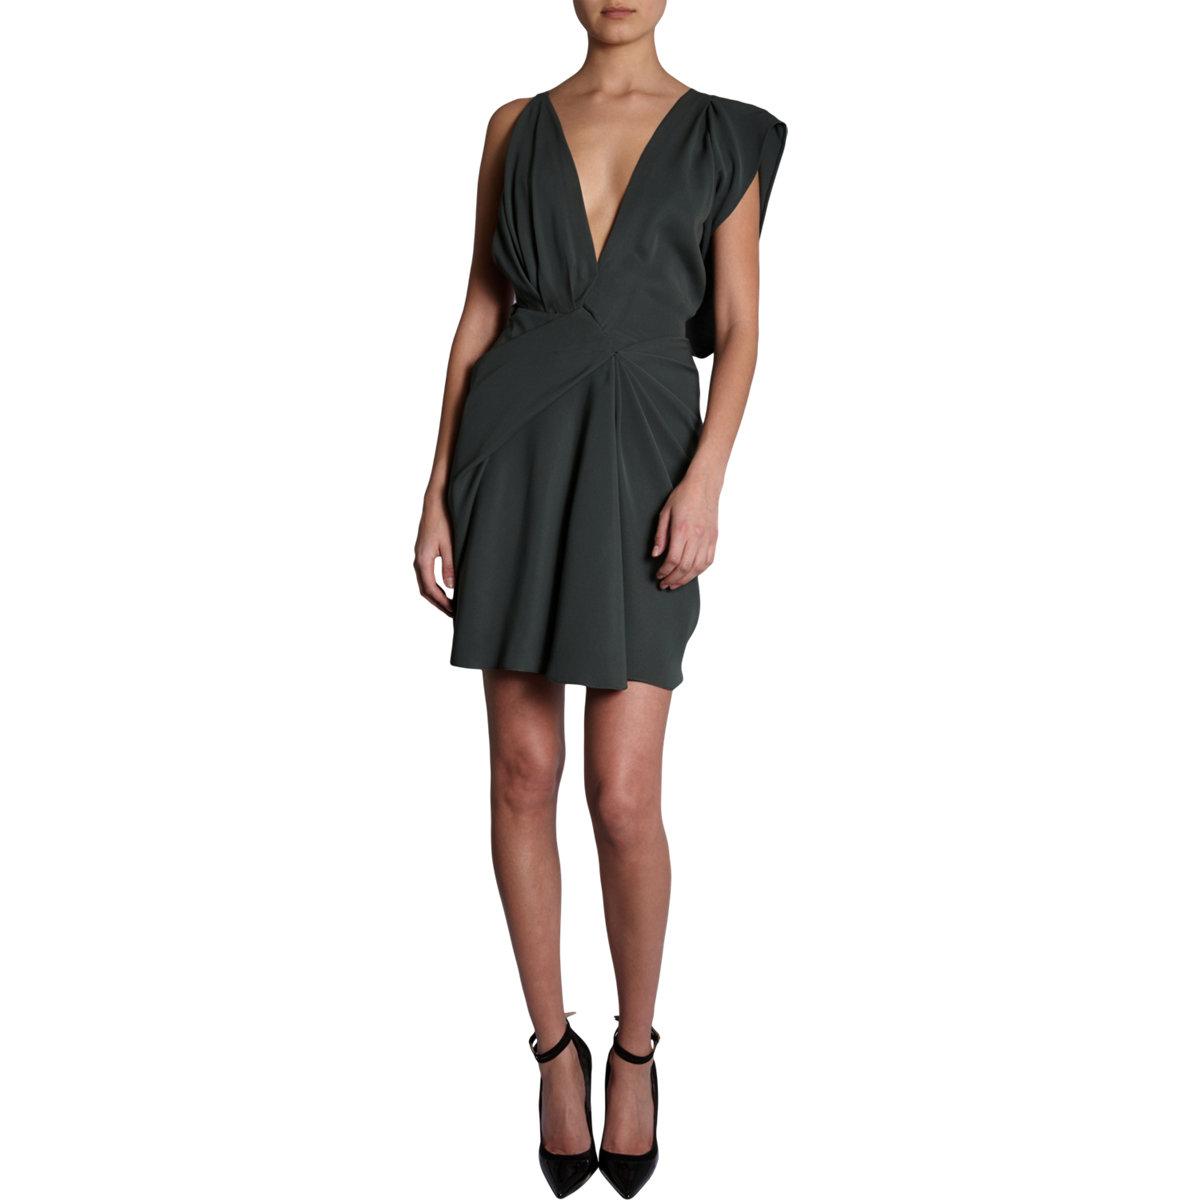 Asymmetric Drape Dress: J. Mendel Asymmetric Drape Dress In Blue